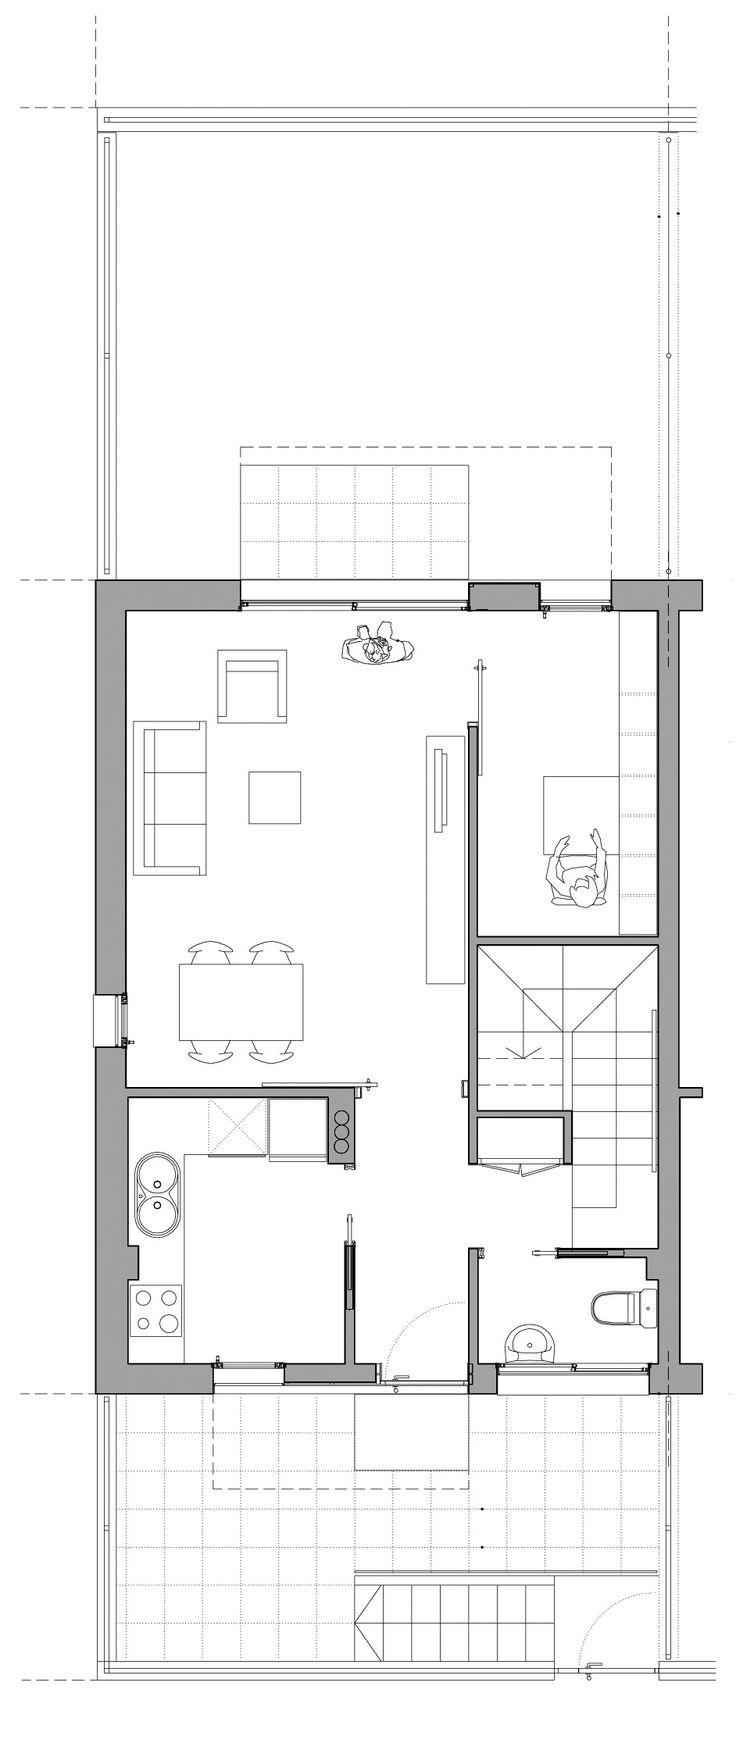 M s de 1000 ideas sobre planos de vivienda estrecha en for Viviendas pequenas planos